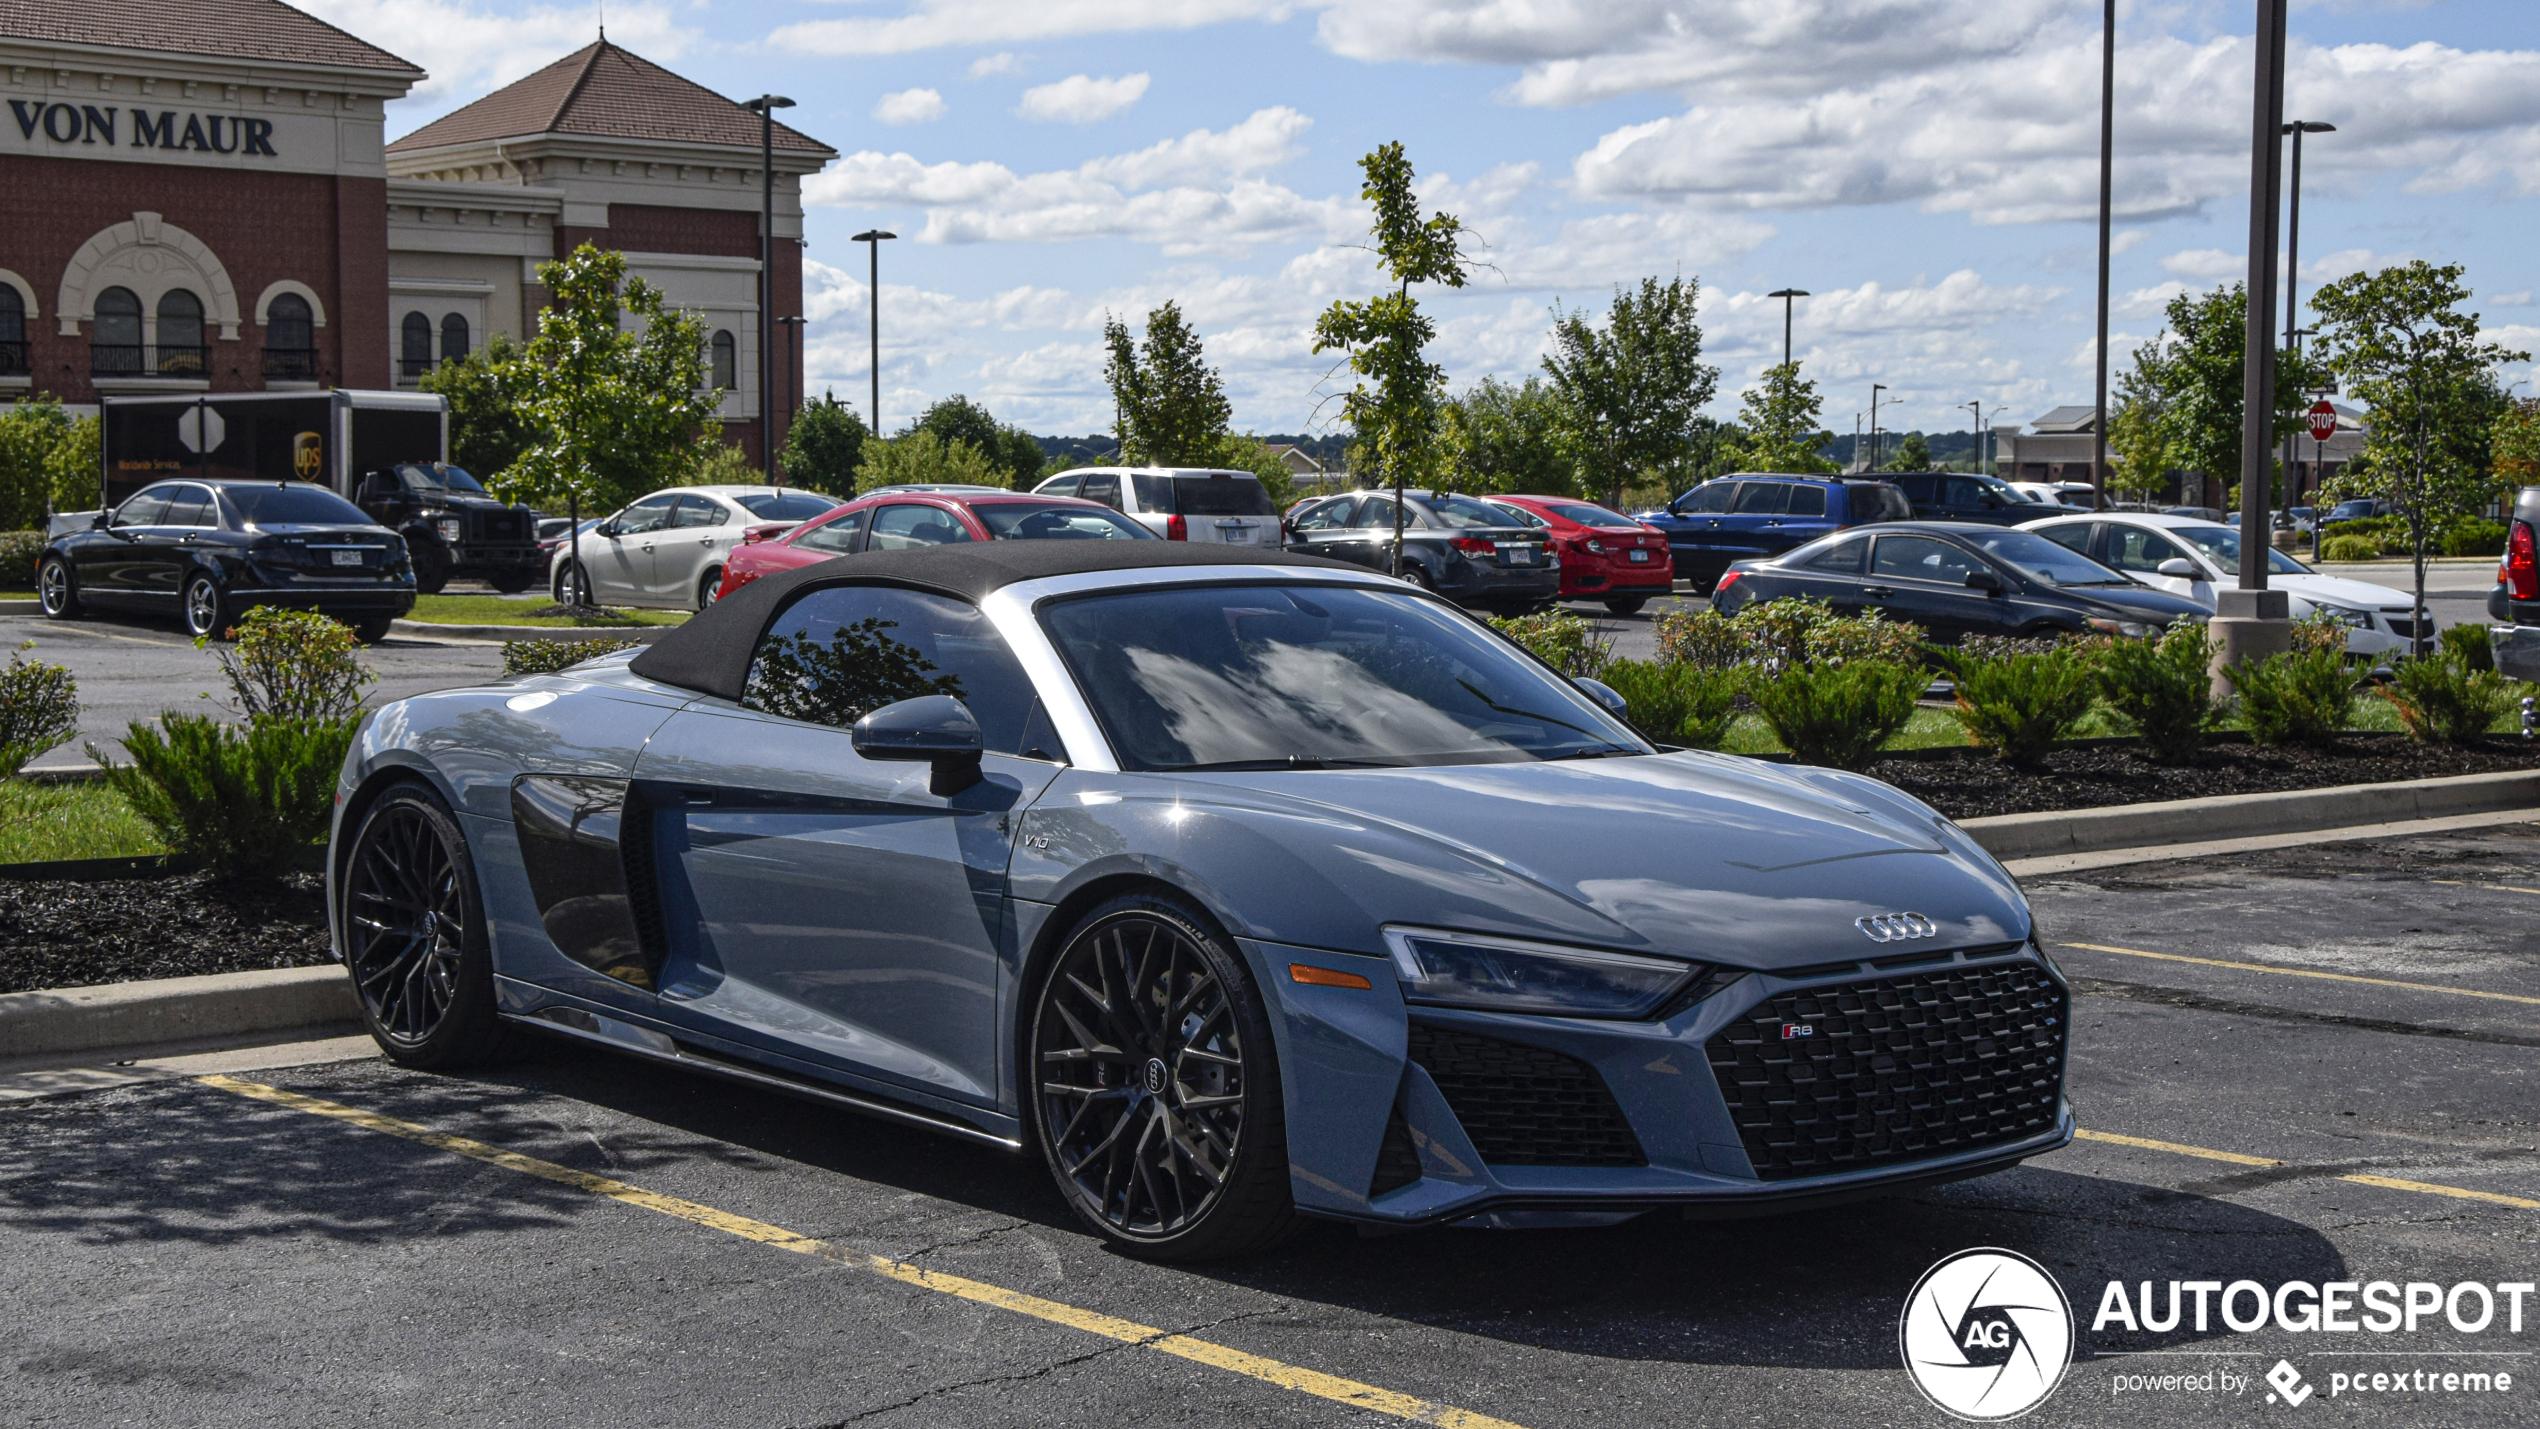 Audi R8 V10 Spyder 2019